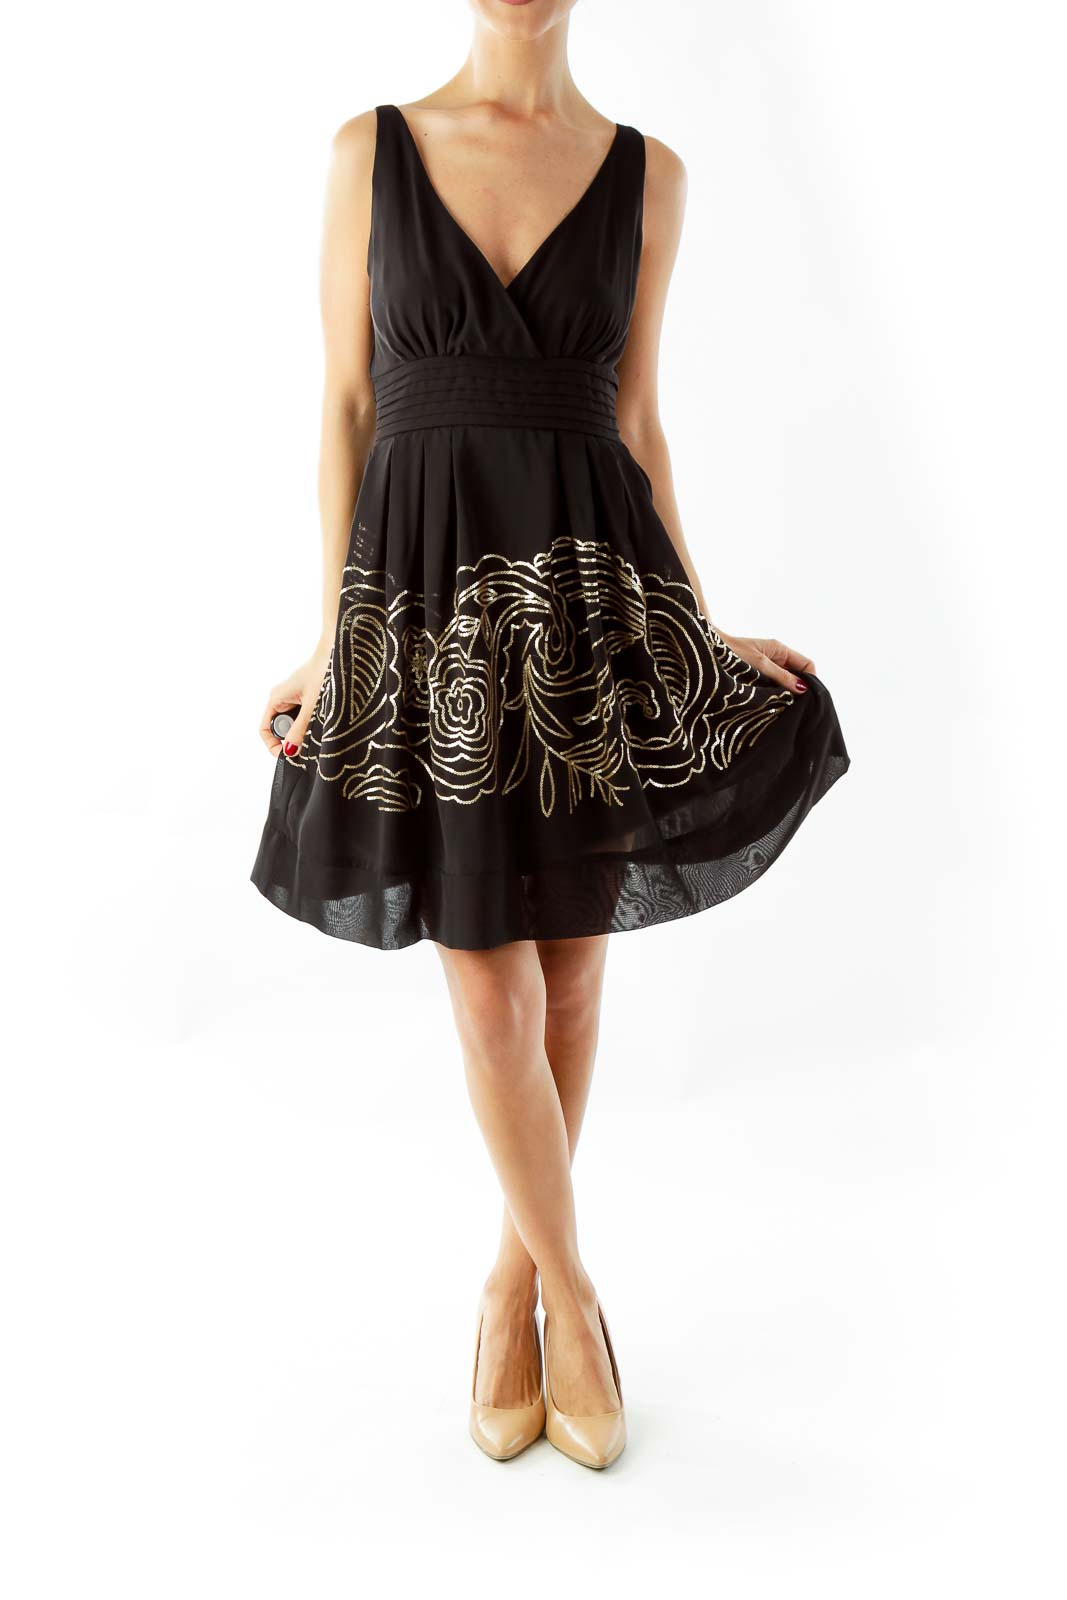 Black & Gold Sequined Dress